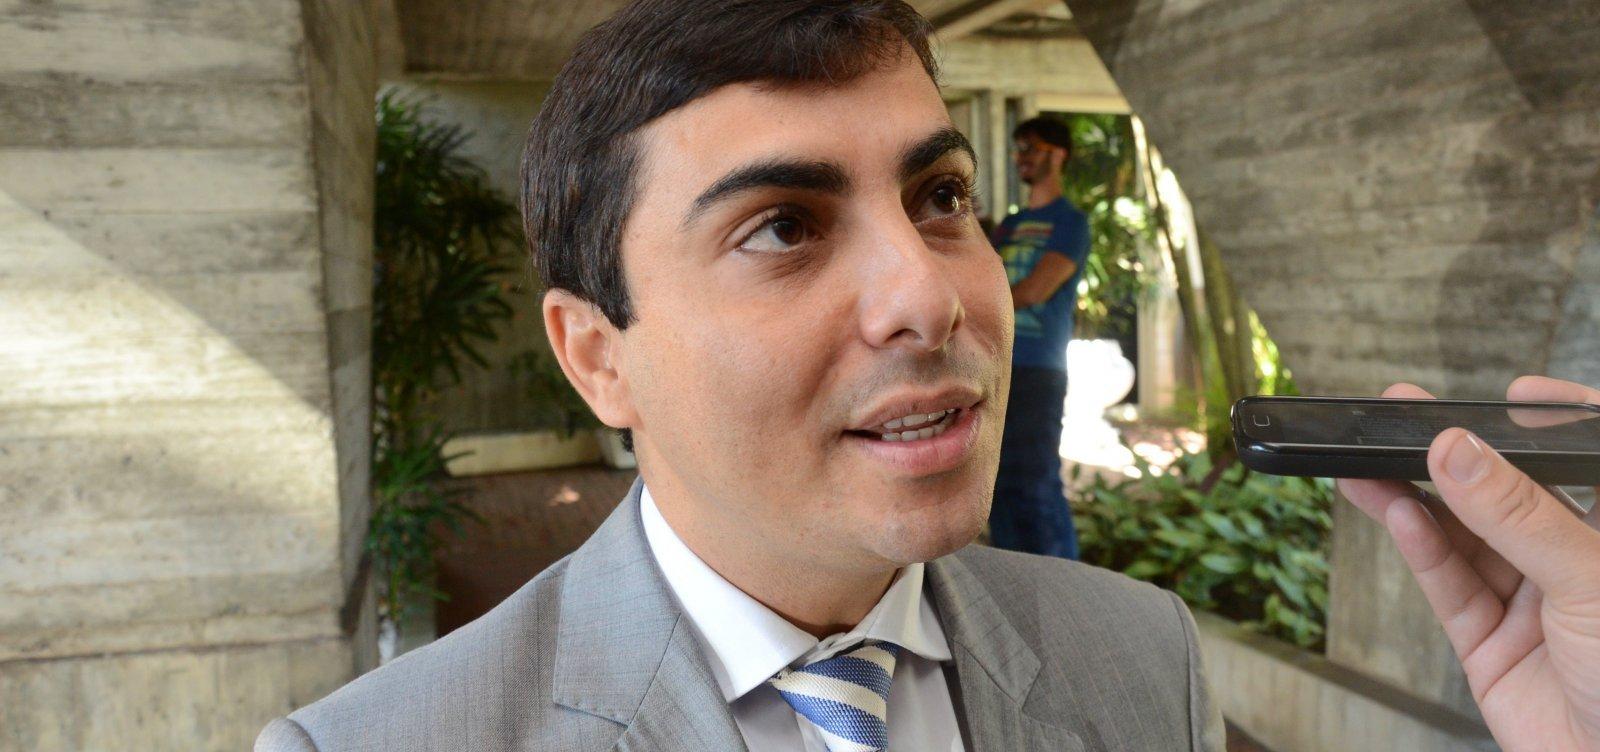 Caso Marcell Moraes: primo diz que amante teve cabelo cortado e foi agredida por deputado